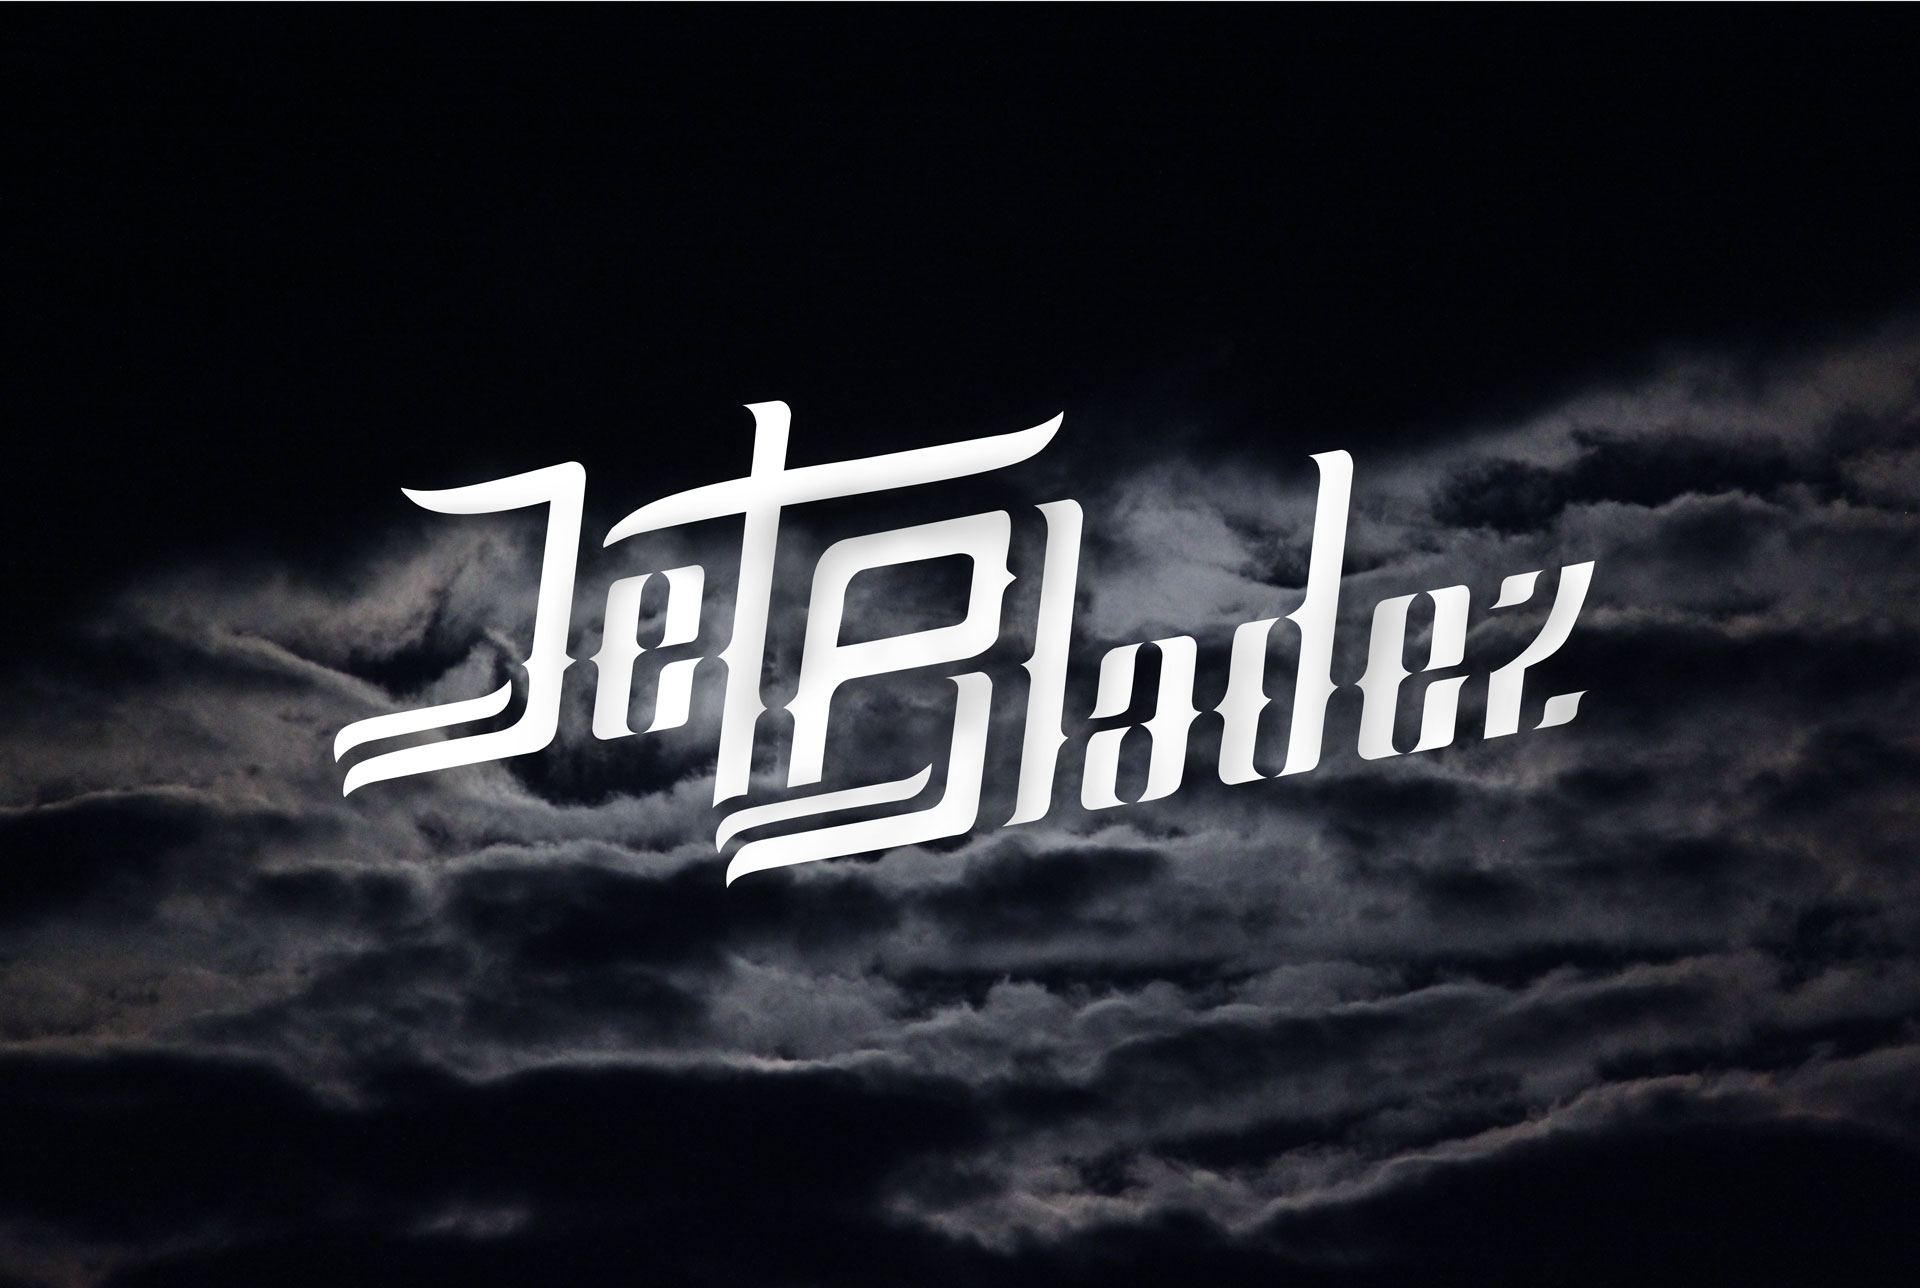 jetbladez1129.jpg